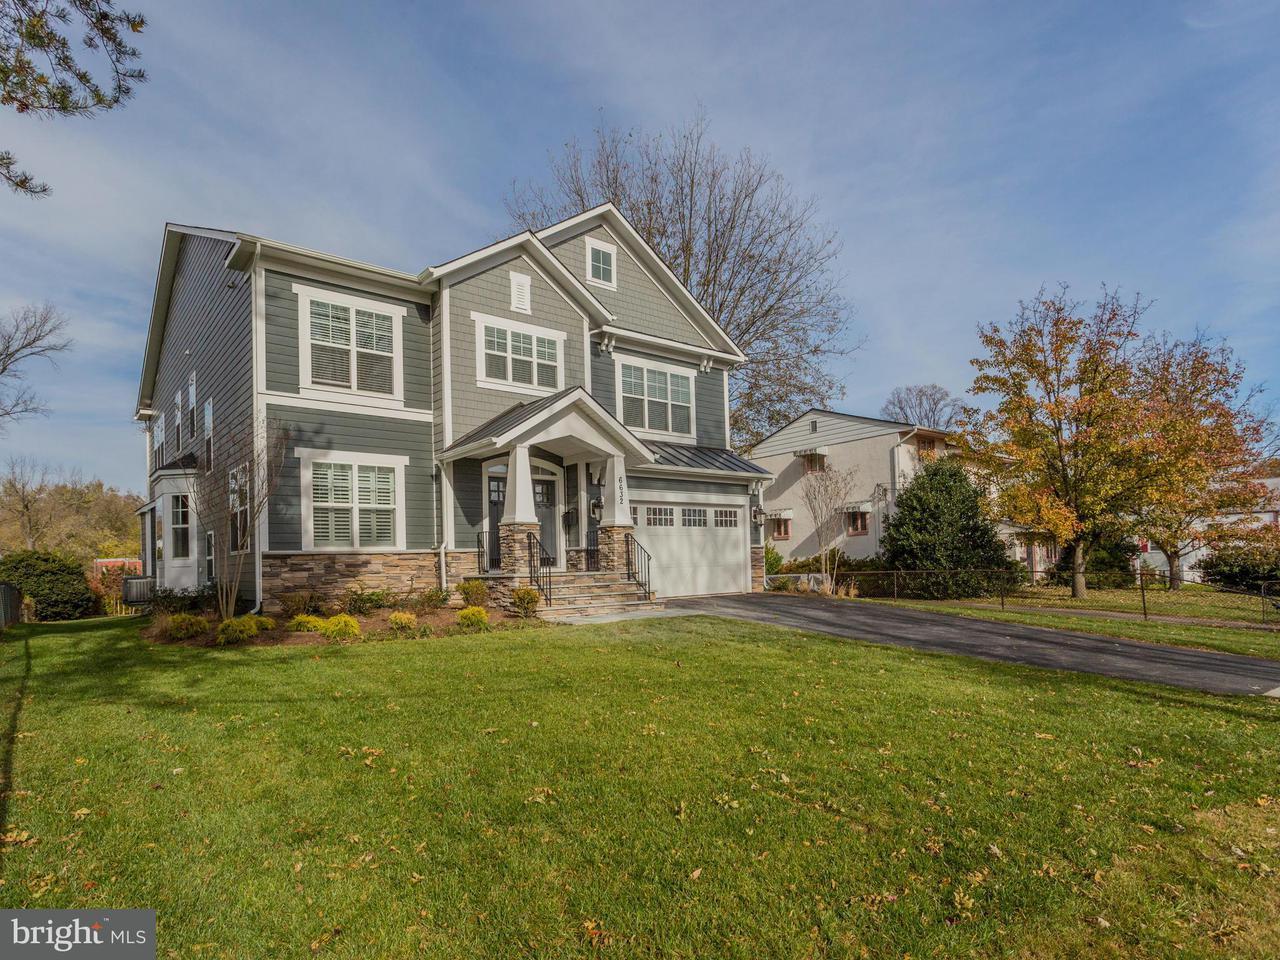 Single Family Home for Sale at 6632 HALLWOOD Avenue 6632 HALLWOOD Avenue Falls Church, Virginia 22046 United States